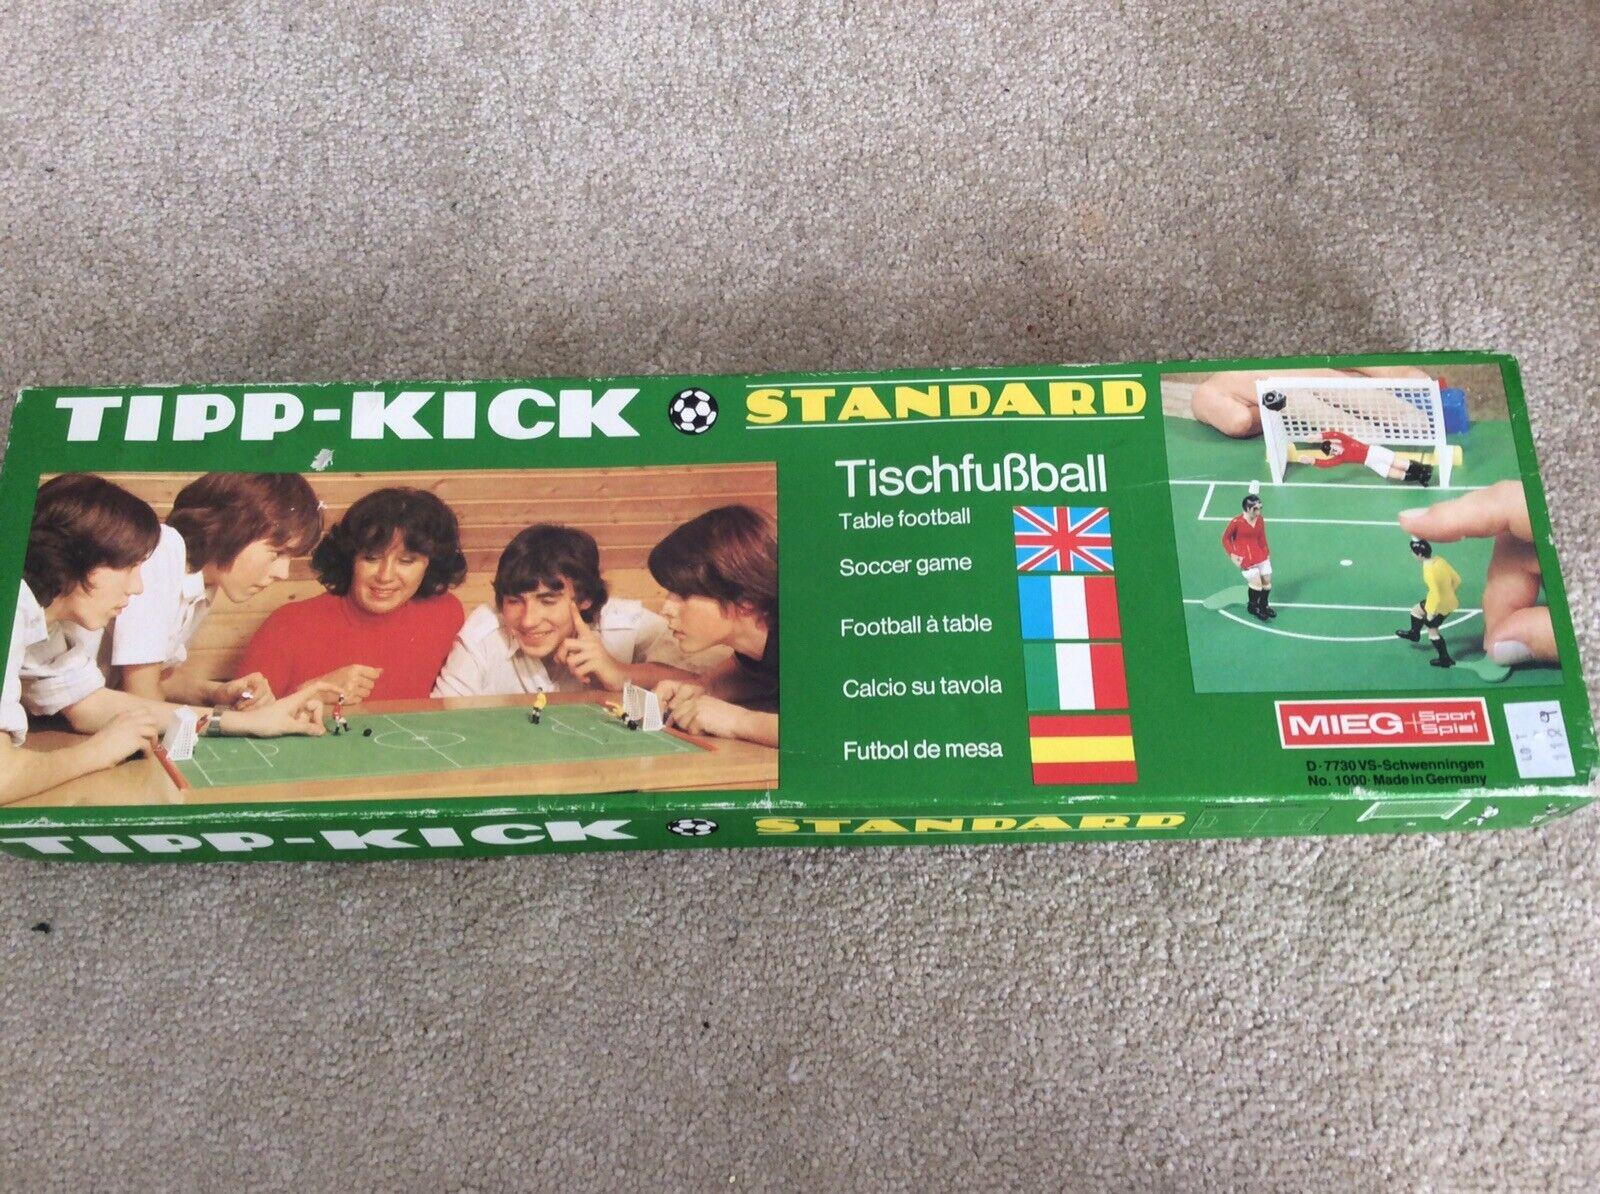 Vintage Tipp-kick Football Game Complete